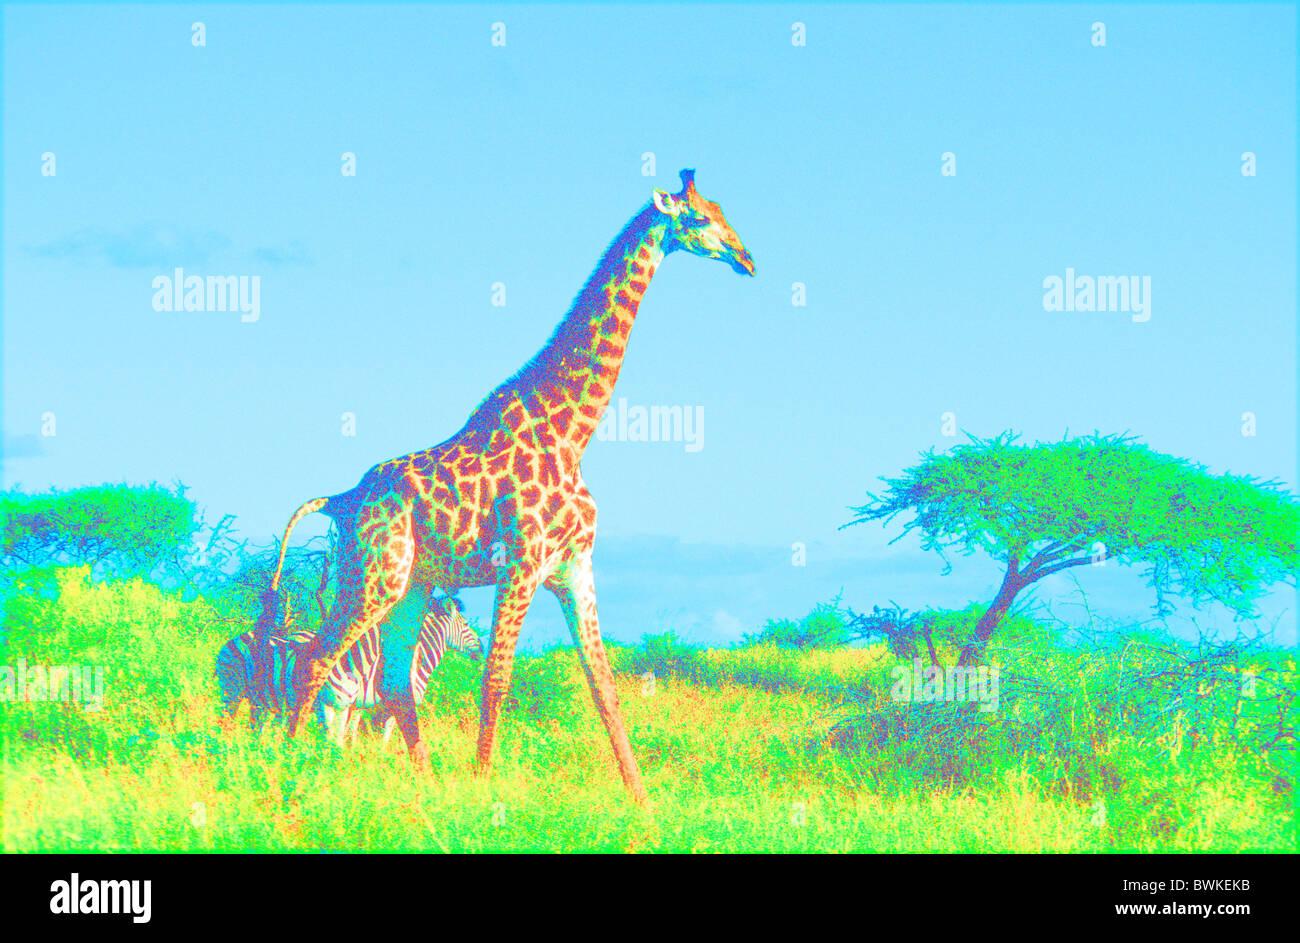 Computer Graphik Grafik Giraffe Zebra Tiere Afrika Savanne Effekt falschen Farben Tiersymbol Stockbild